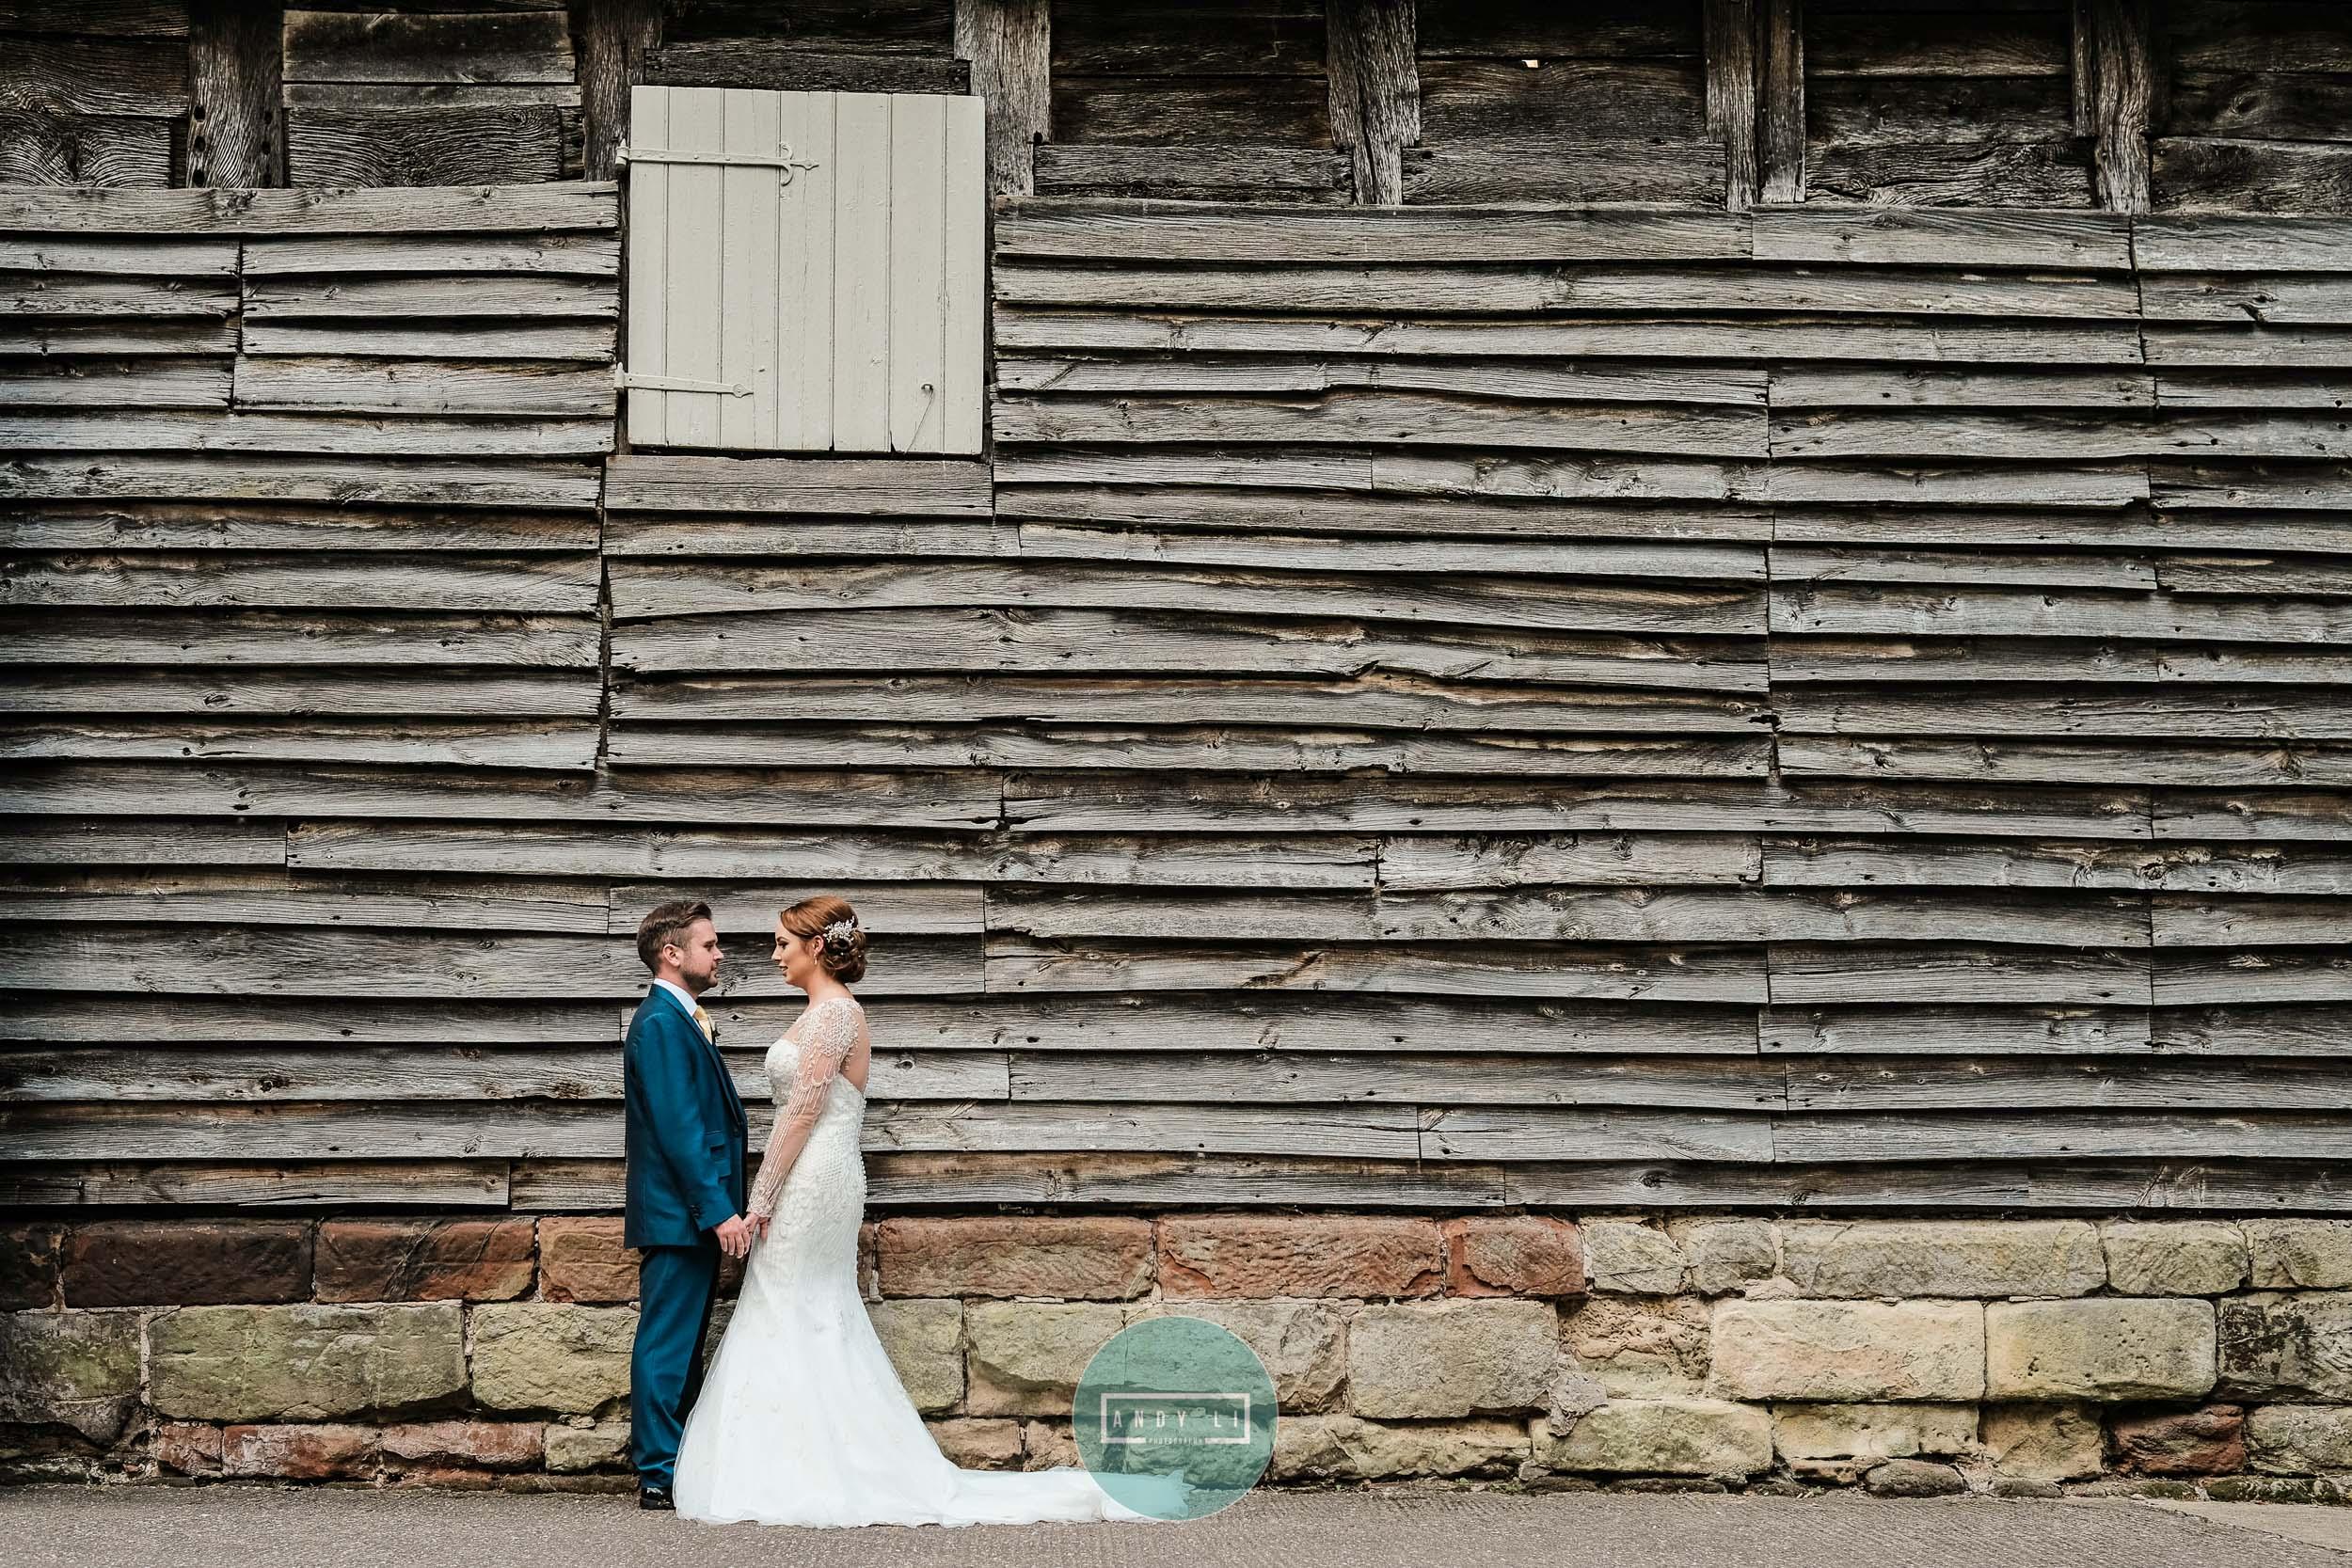 Pimhill Barn Wedding Photographer-094-DSCF0617.jpg